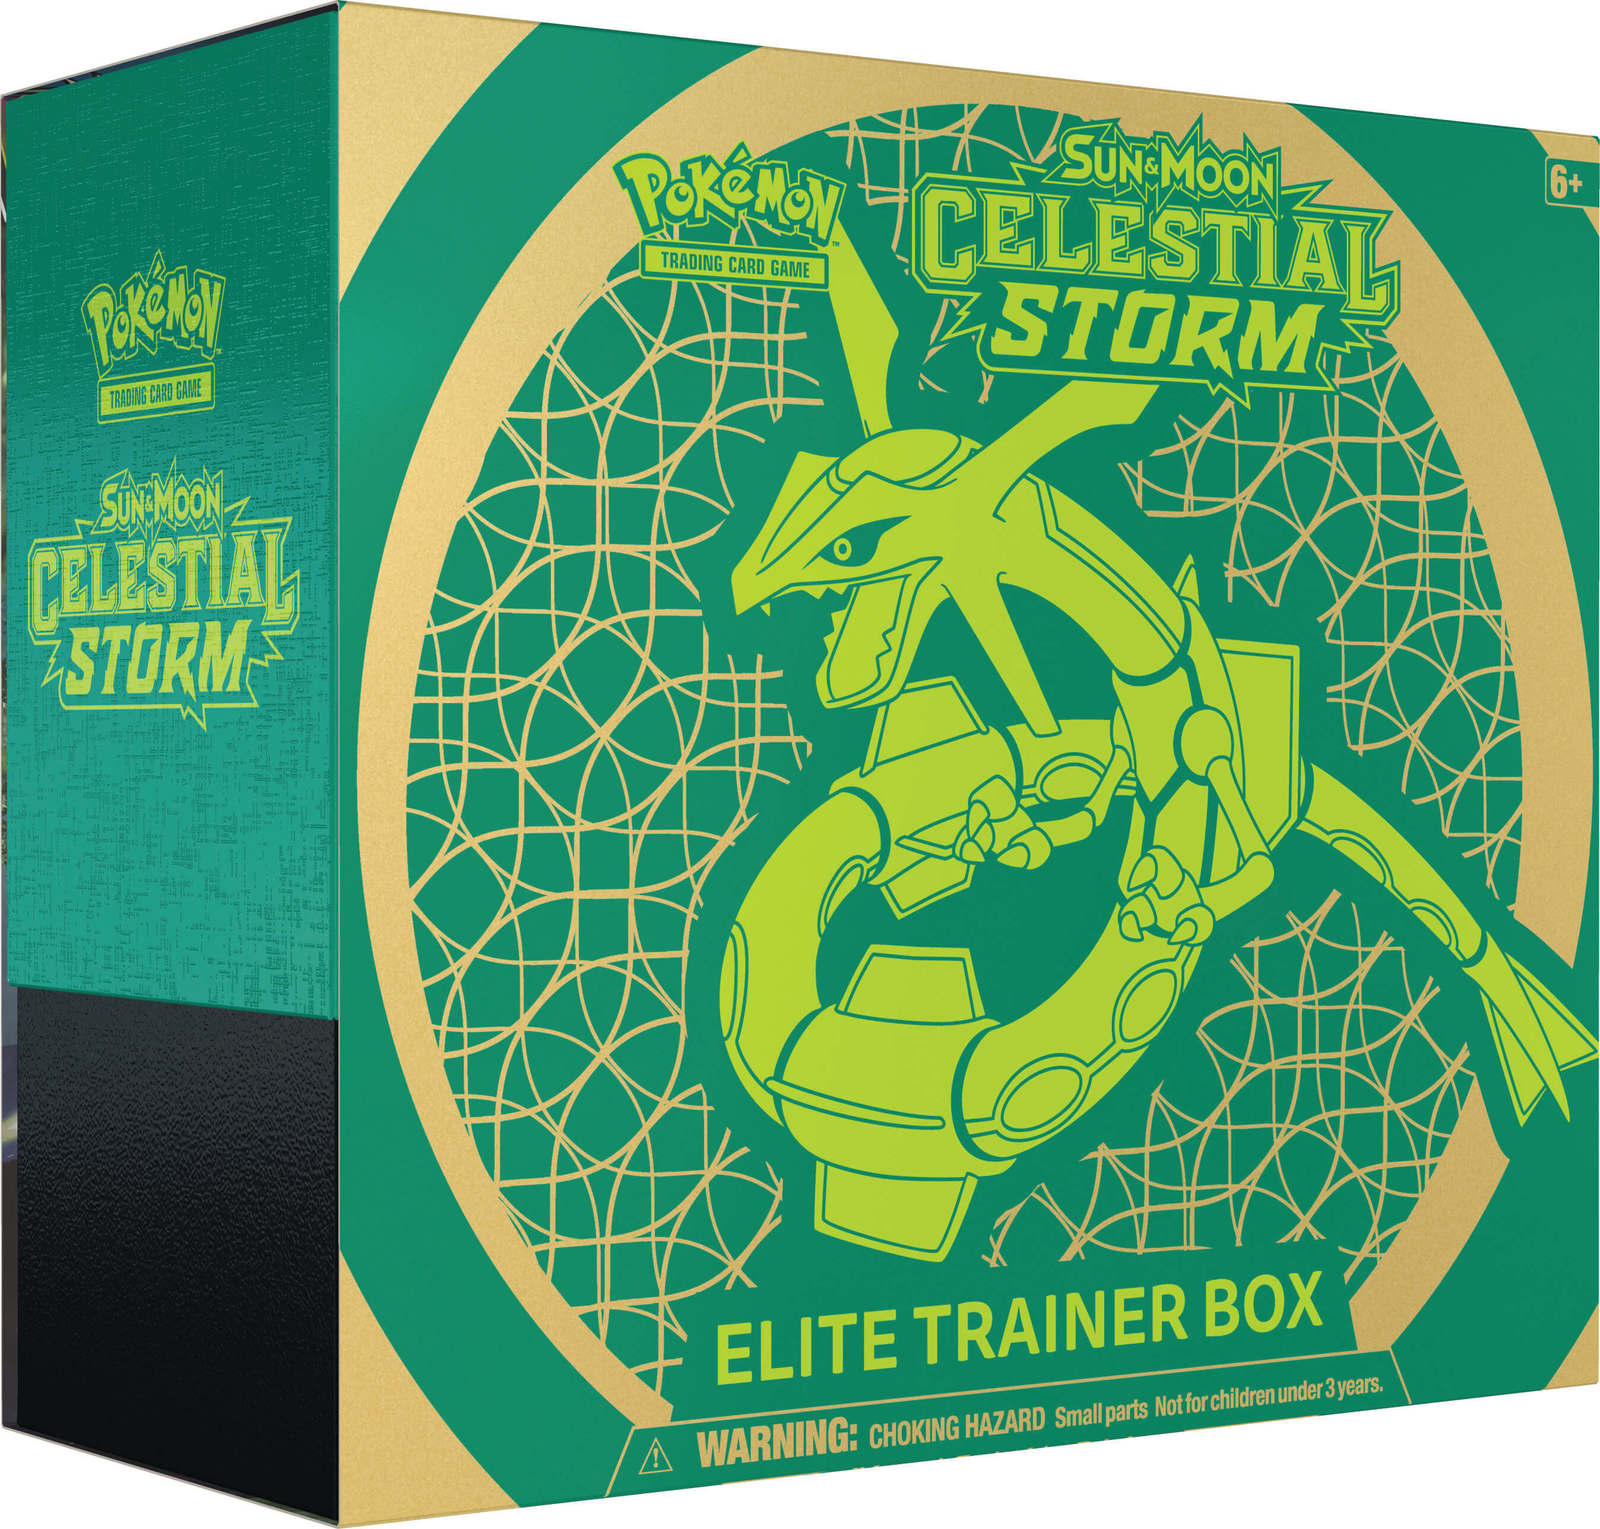 Pokemon TCG: Celestial Storm - Elite Trainer Box image